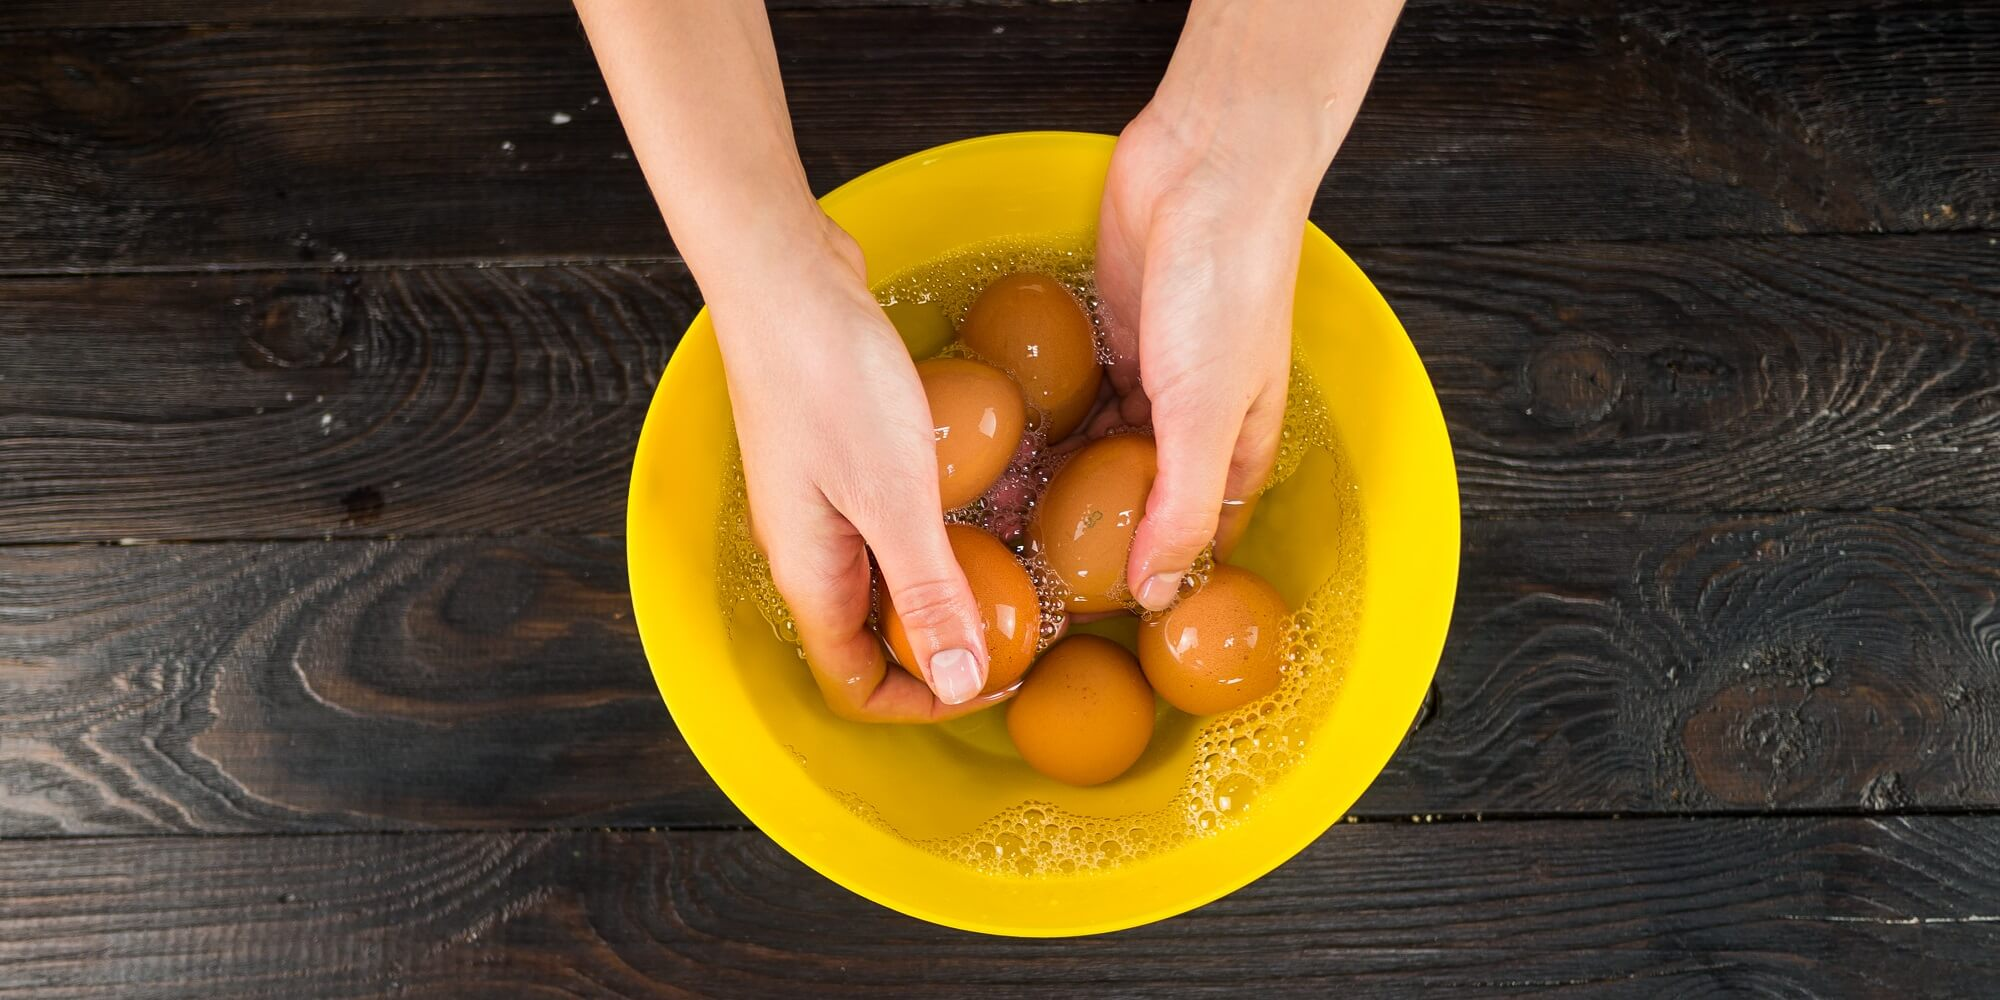 Помойте яйца